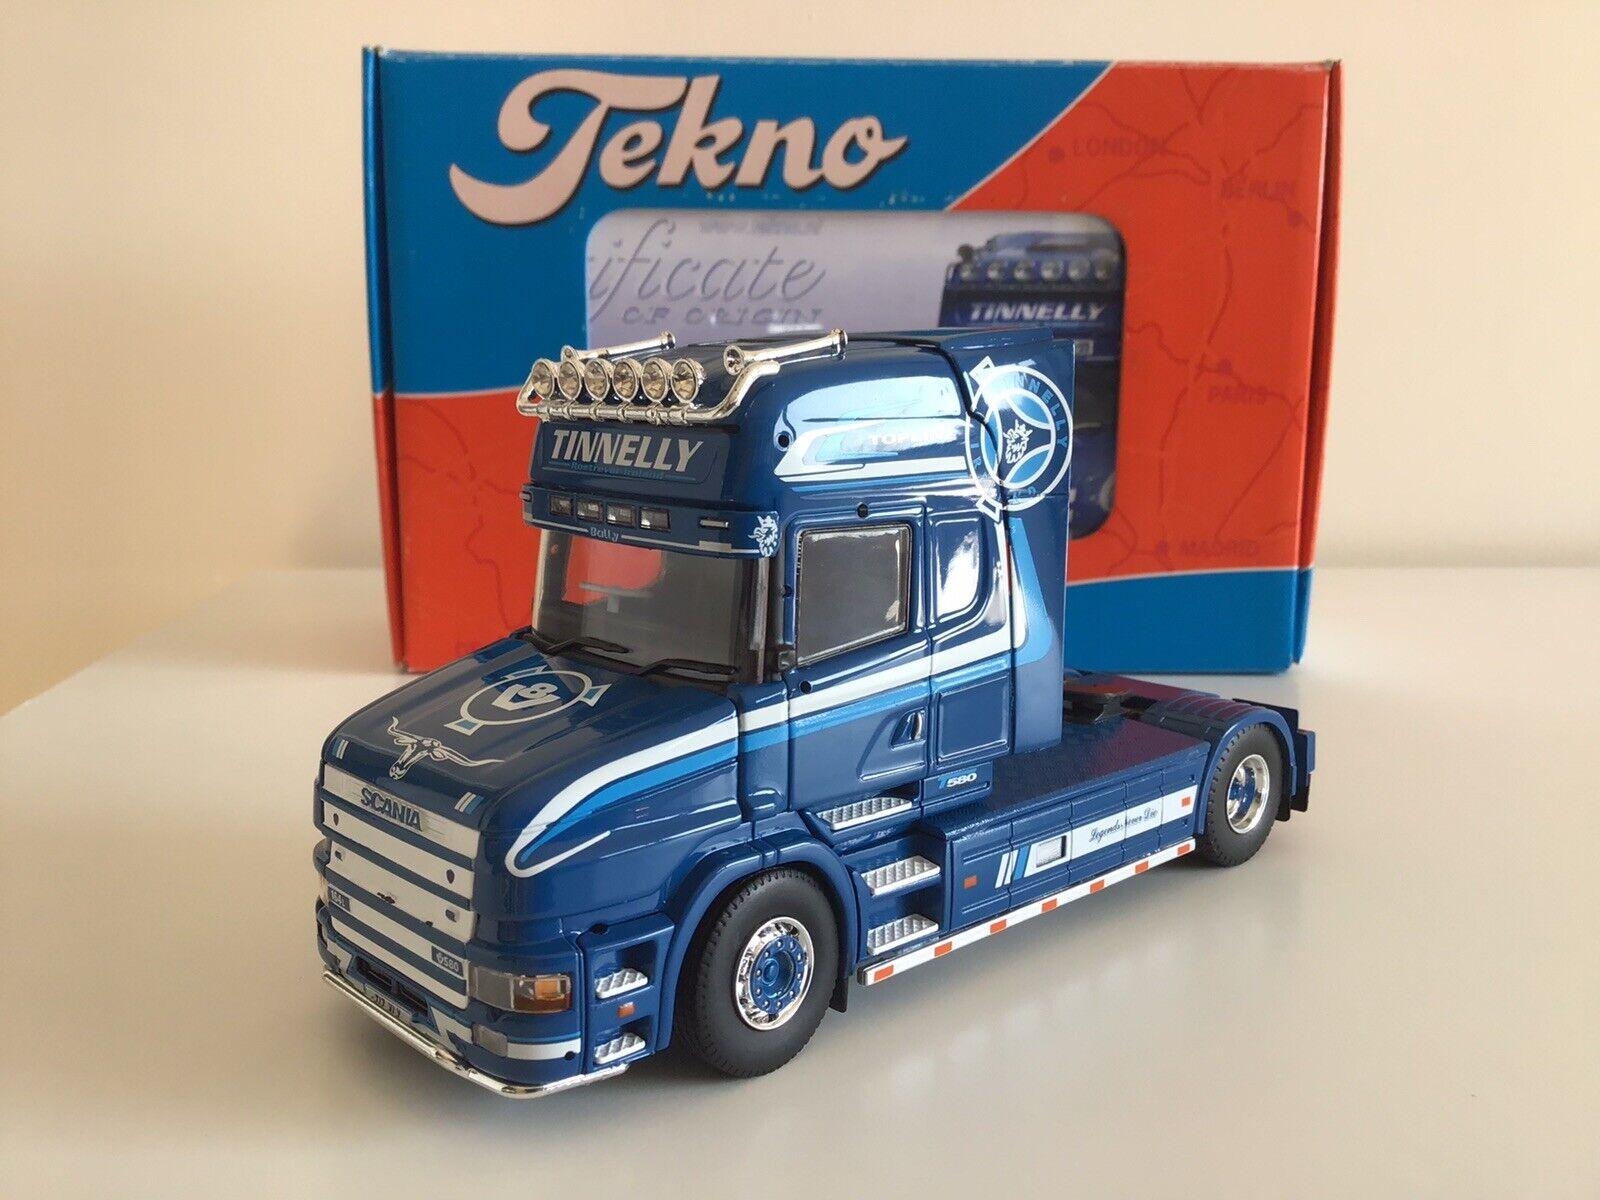 Tekno Scania T Cab Topline Tinnelly Tractor Unit